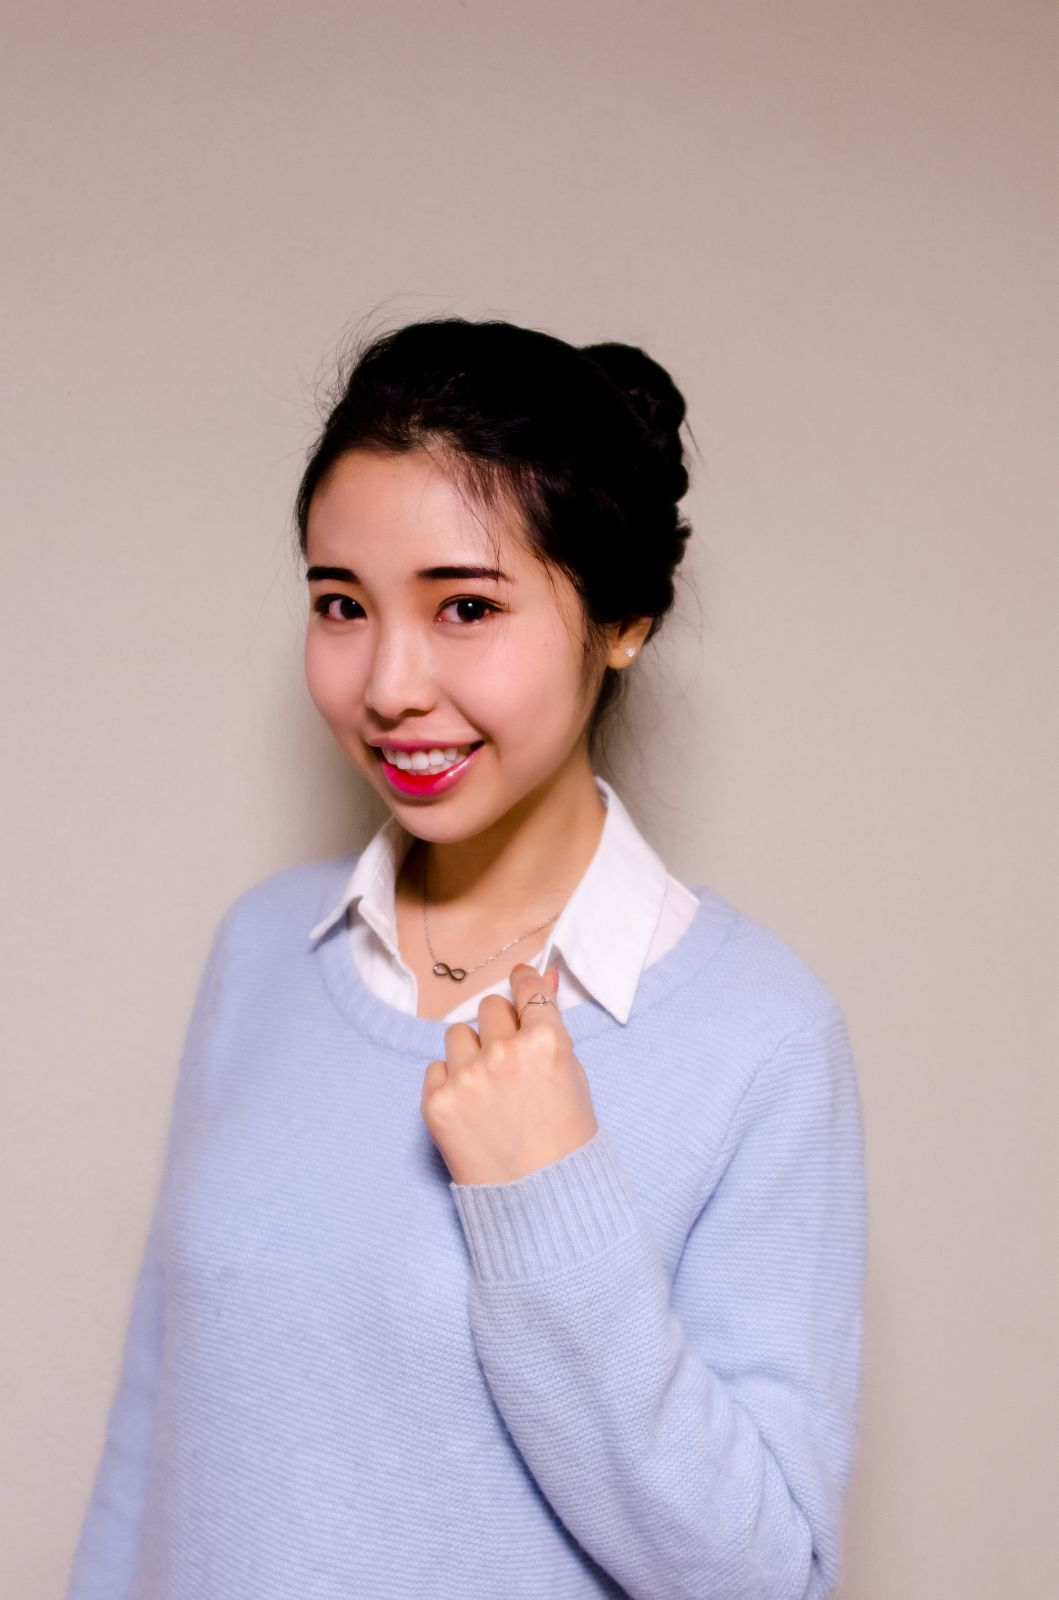 dainty asian woman